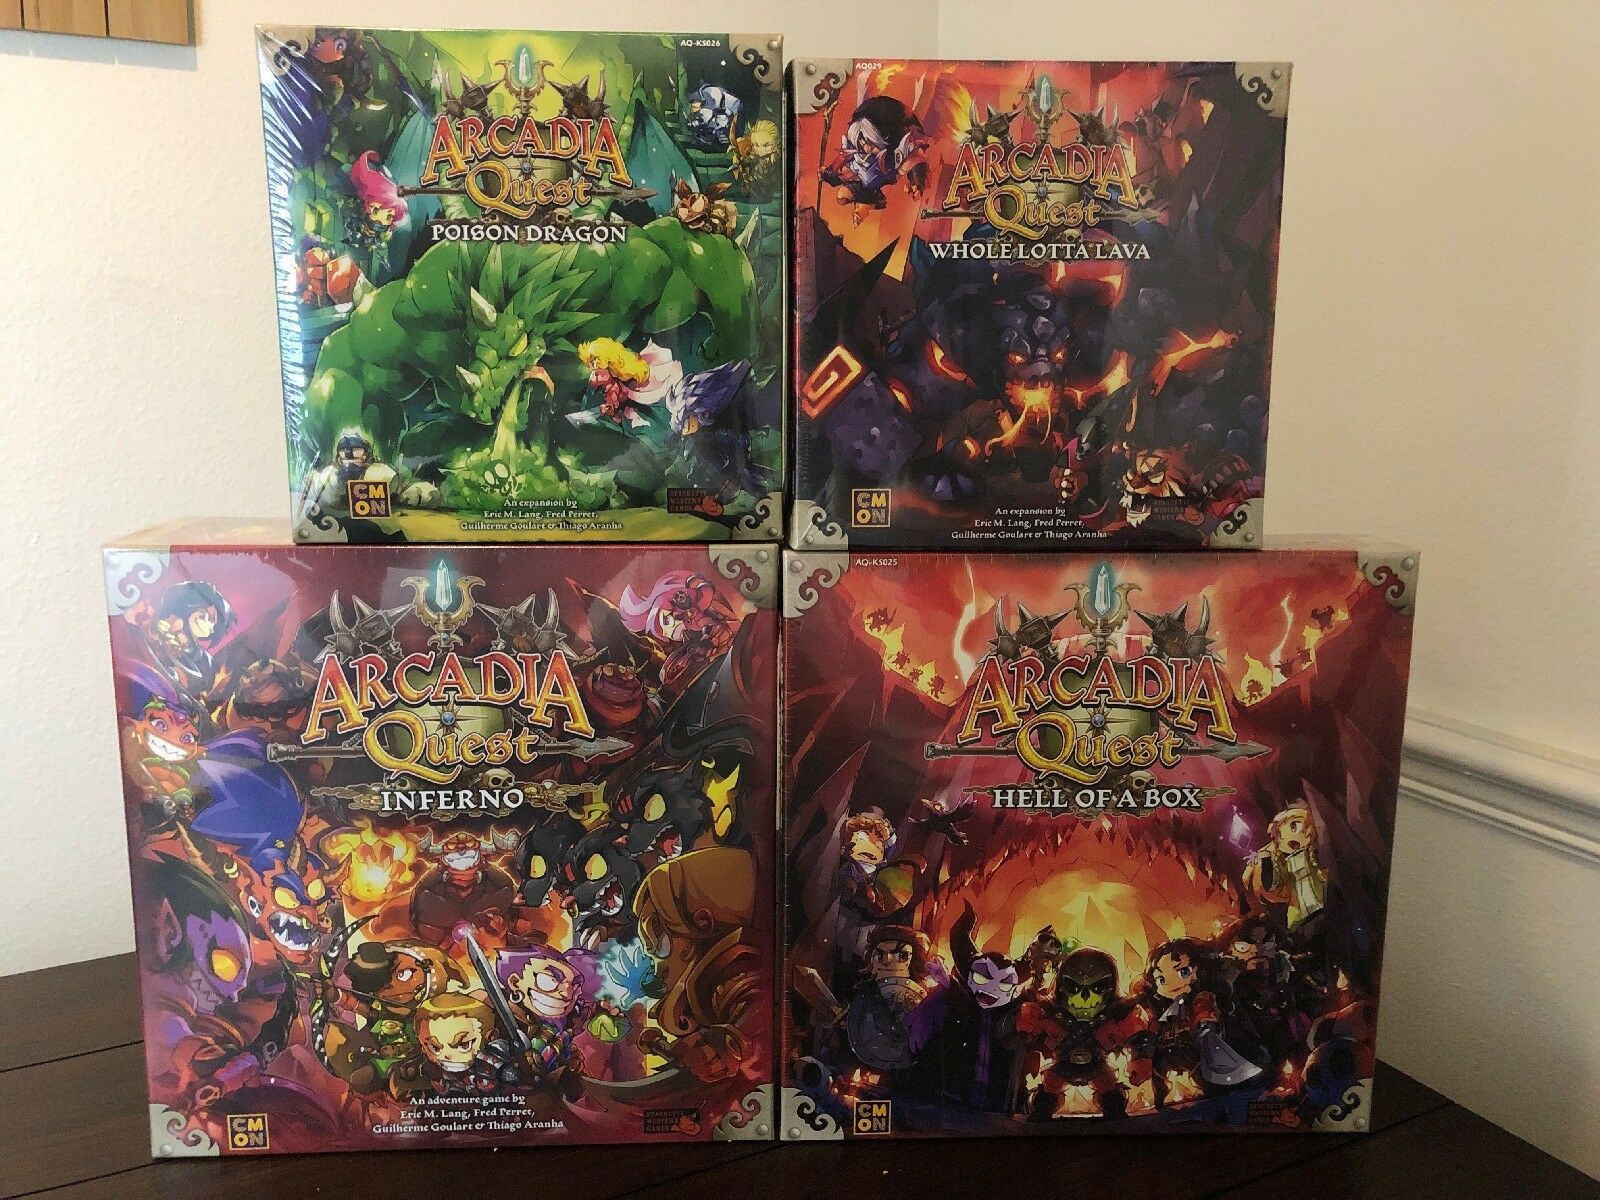 Arcadia Quest Inferno Kickstarter-infierno de una promesa-Kickstarter Exclusives cmon